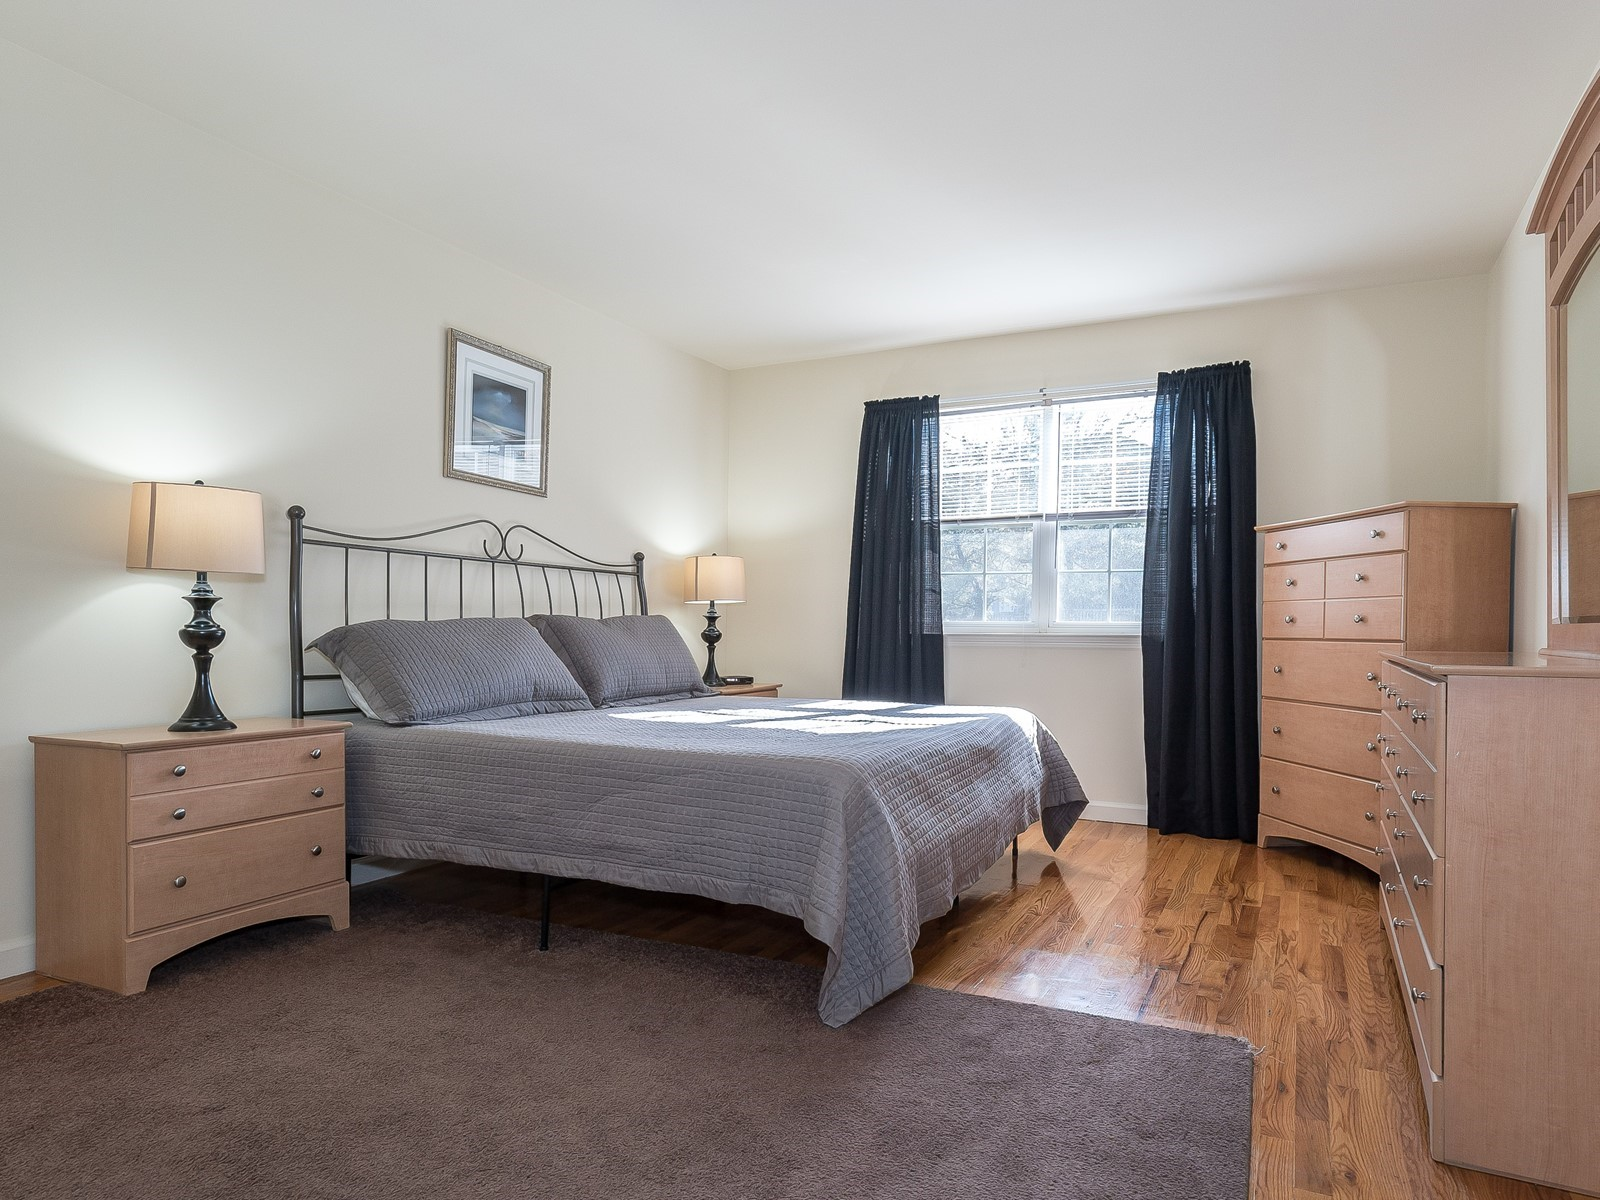 07-Bridgewater FurnishedApartment_22_Master Bedroom